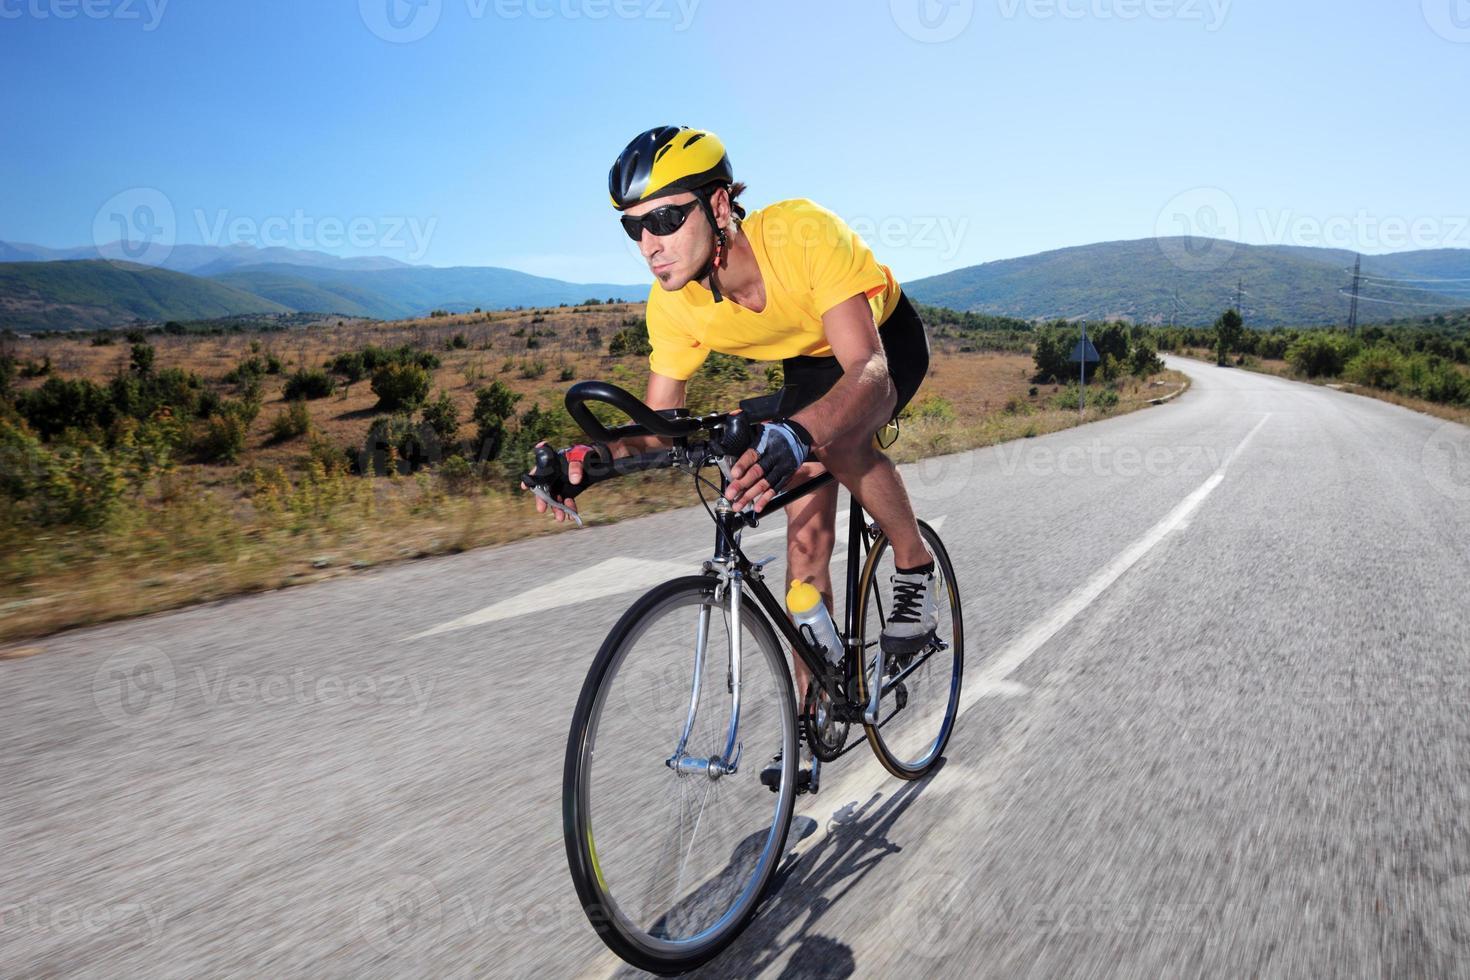 Radfahrer Fahrrad fahren foto